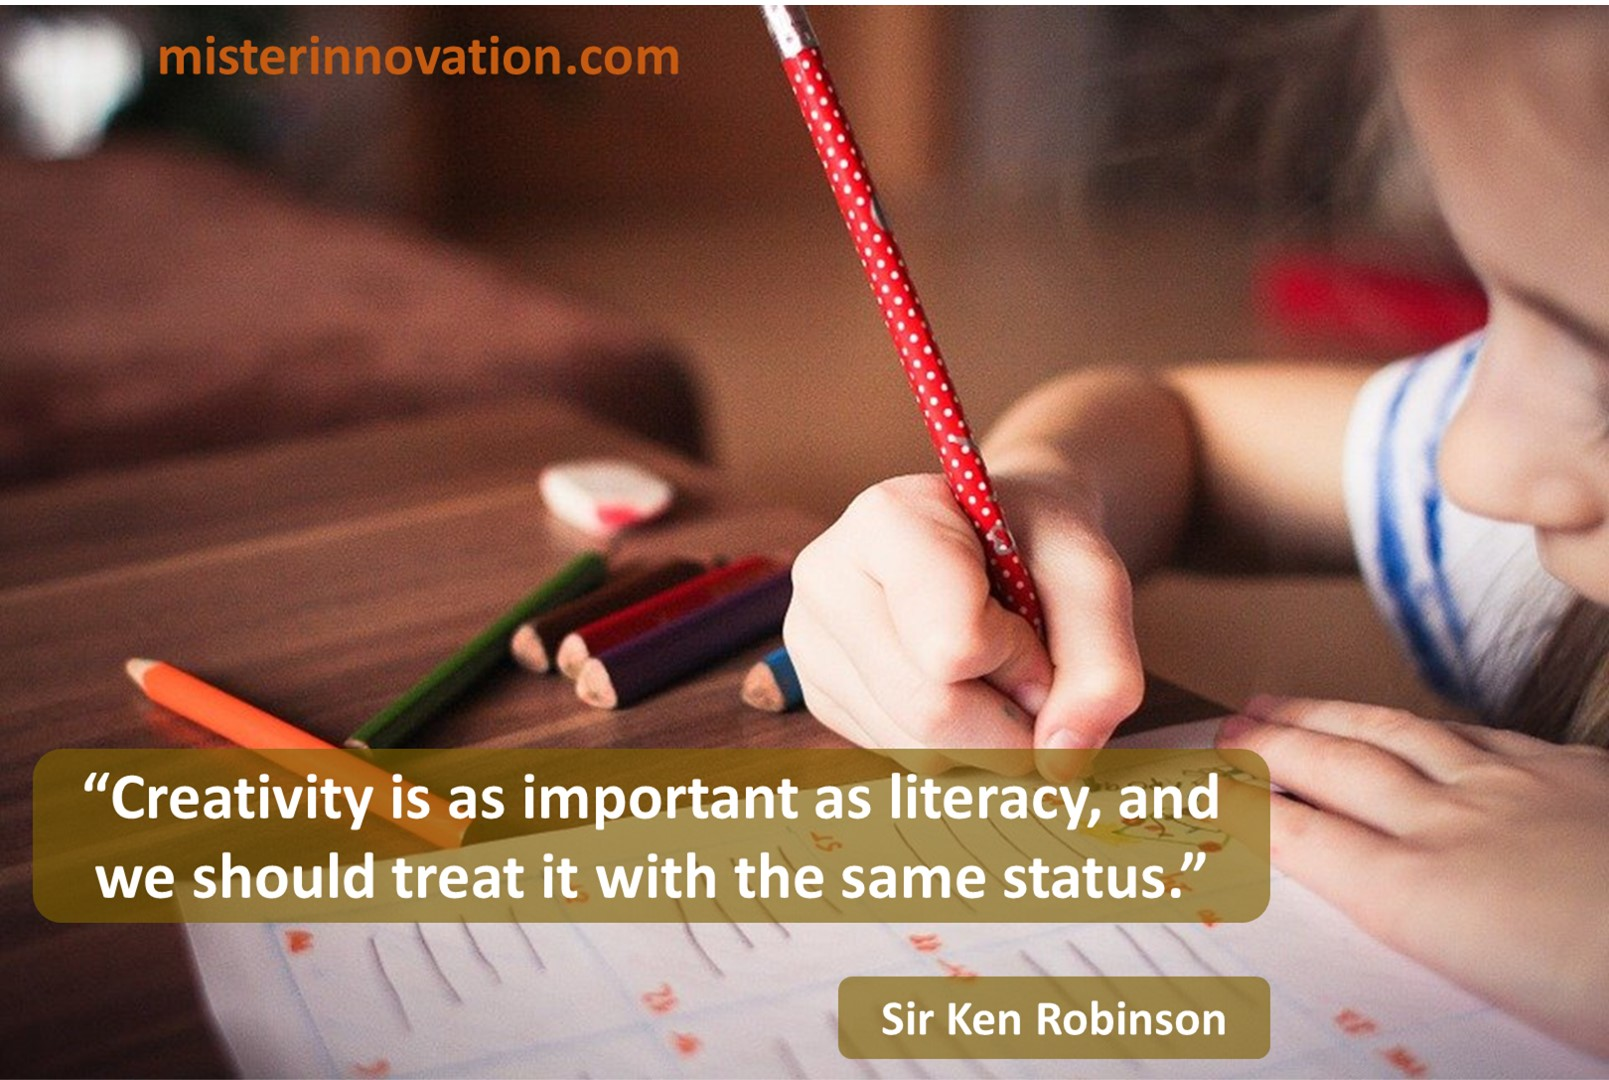 Sir Ken Robinson Creativity Literacy